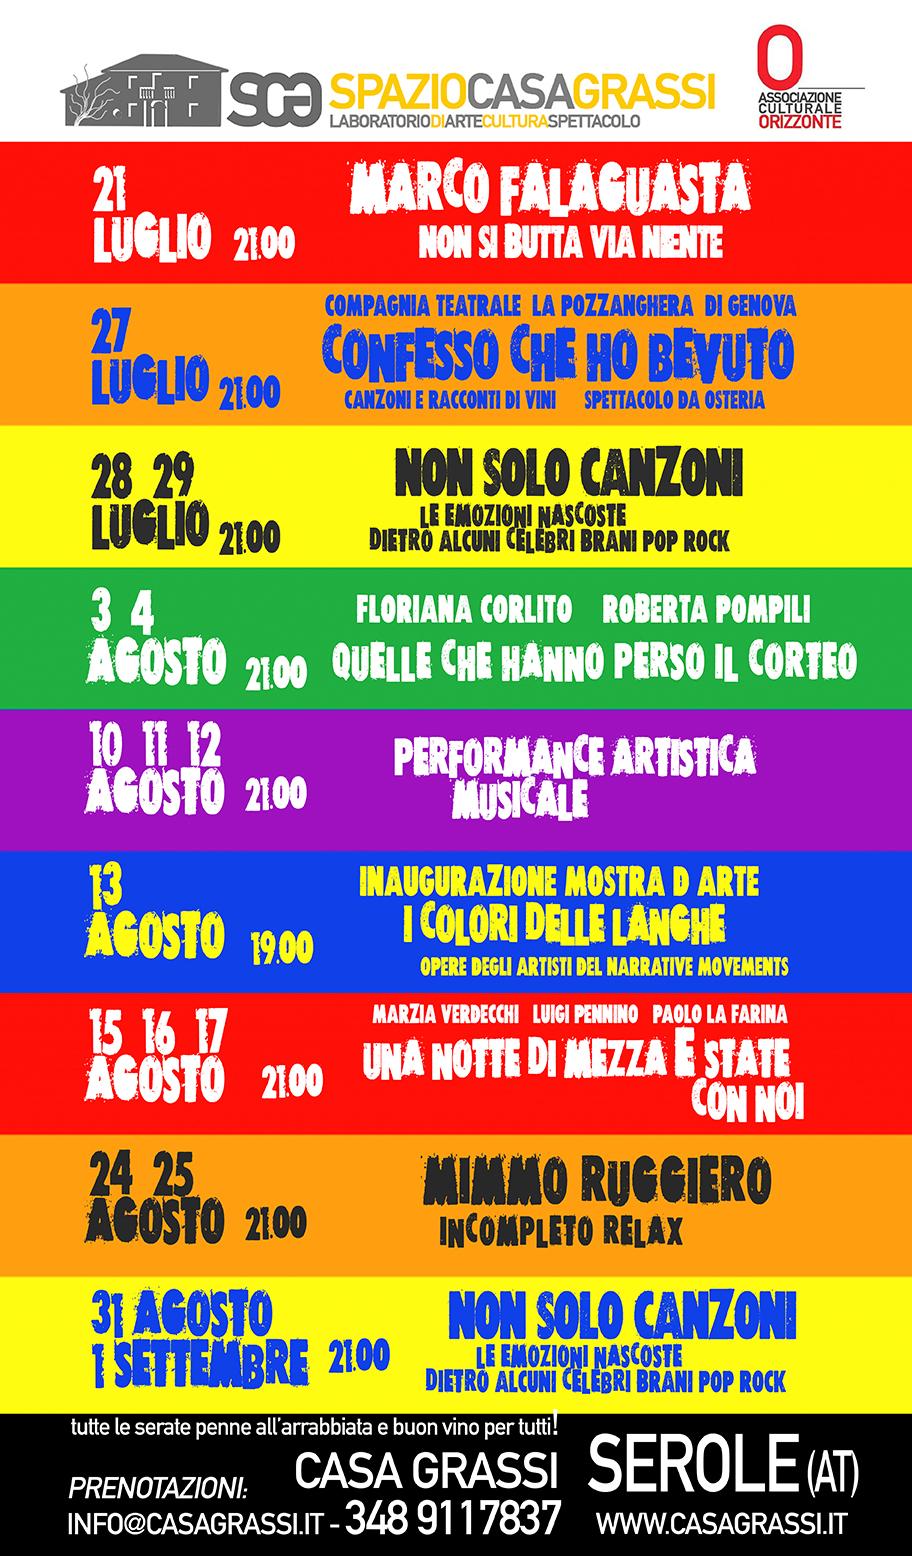 Federdanza Calendario.Senza Categoria Archivi Casa Grassi Casa Grassi